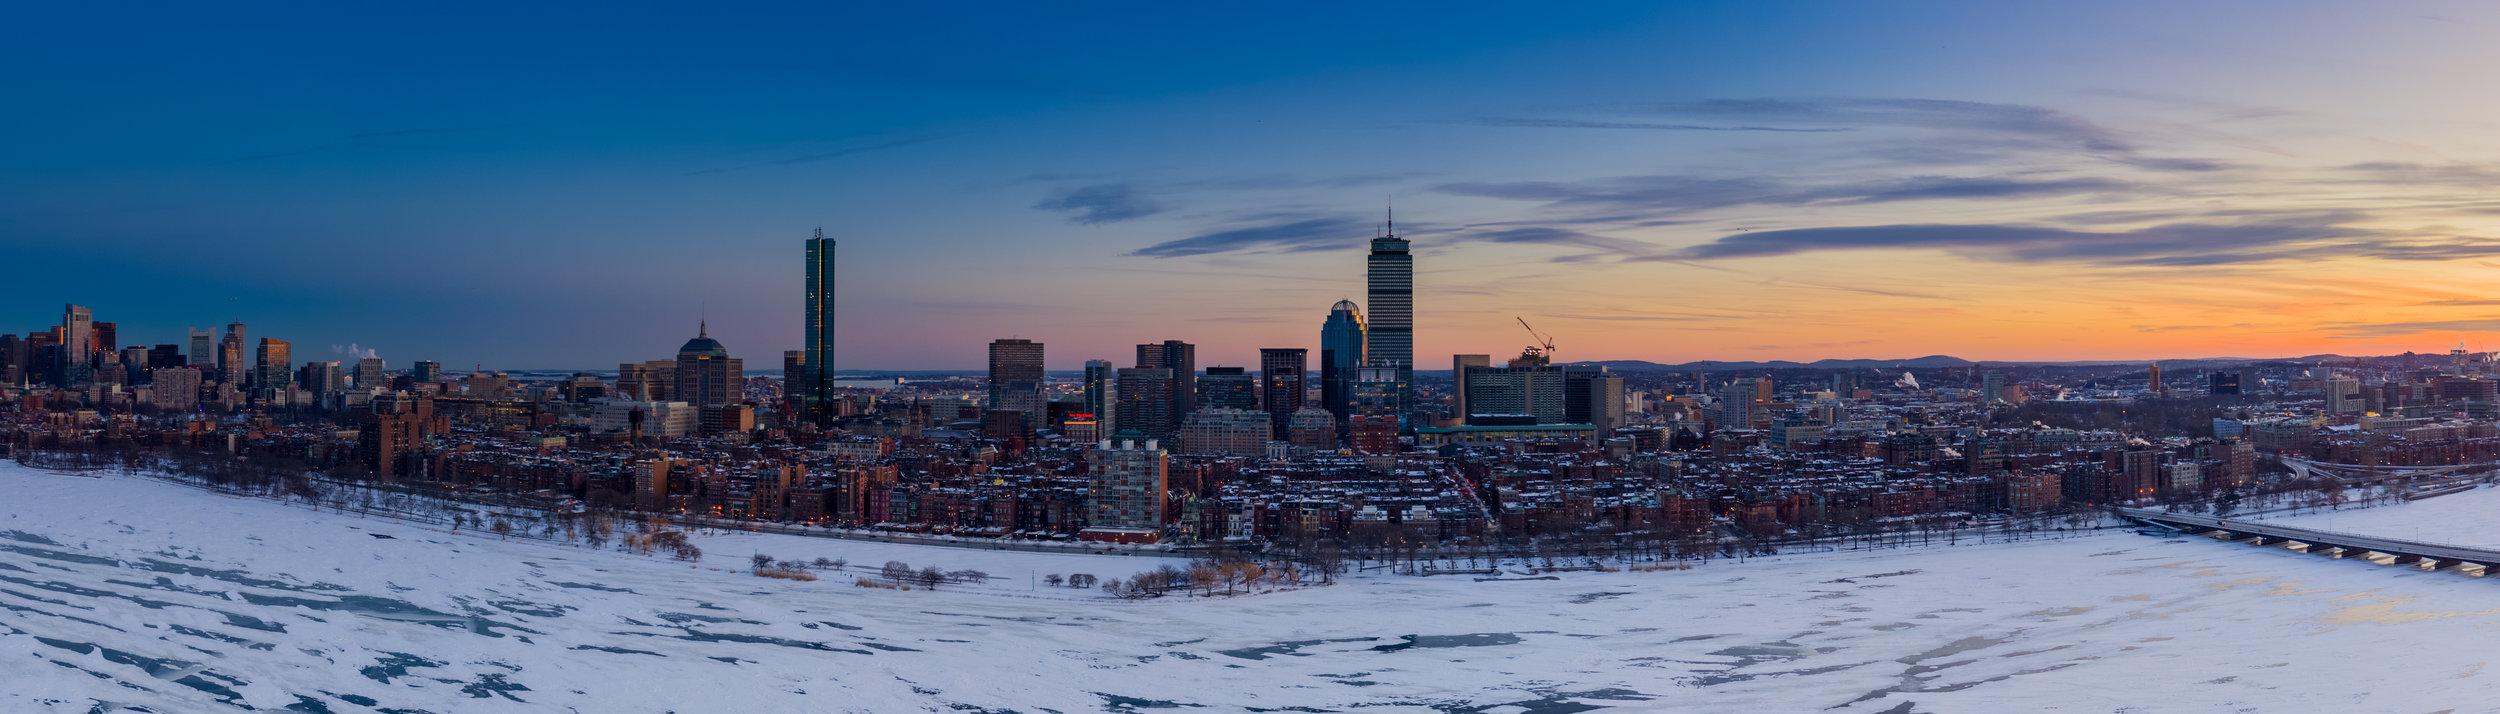 Charles River: Boston, MA